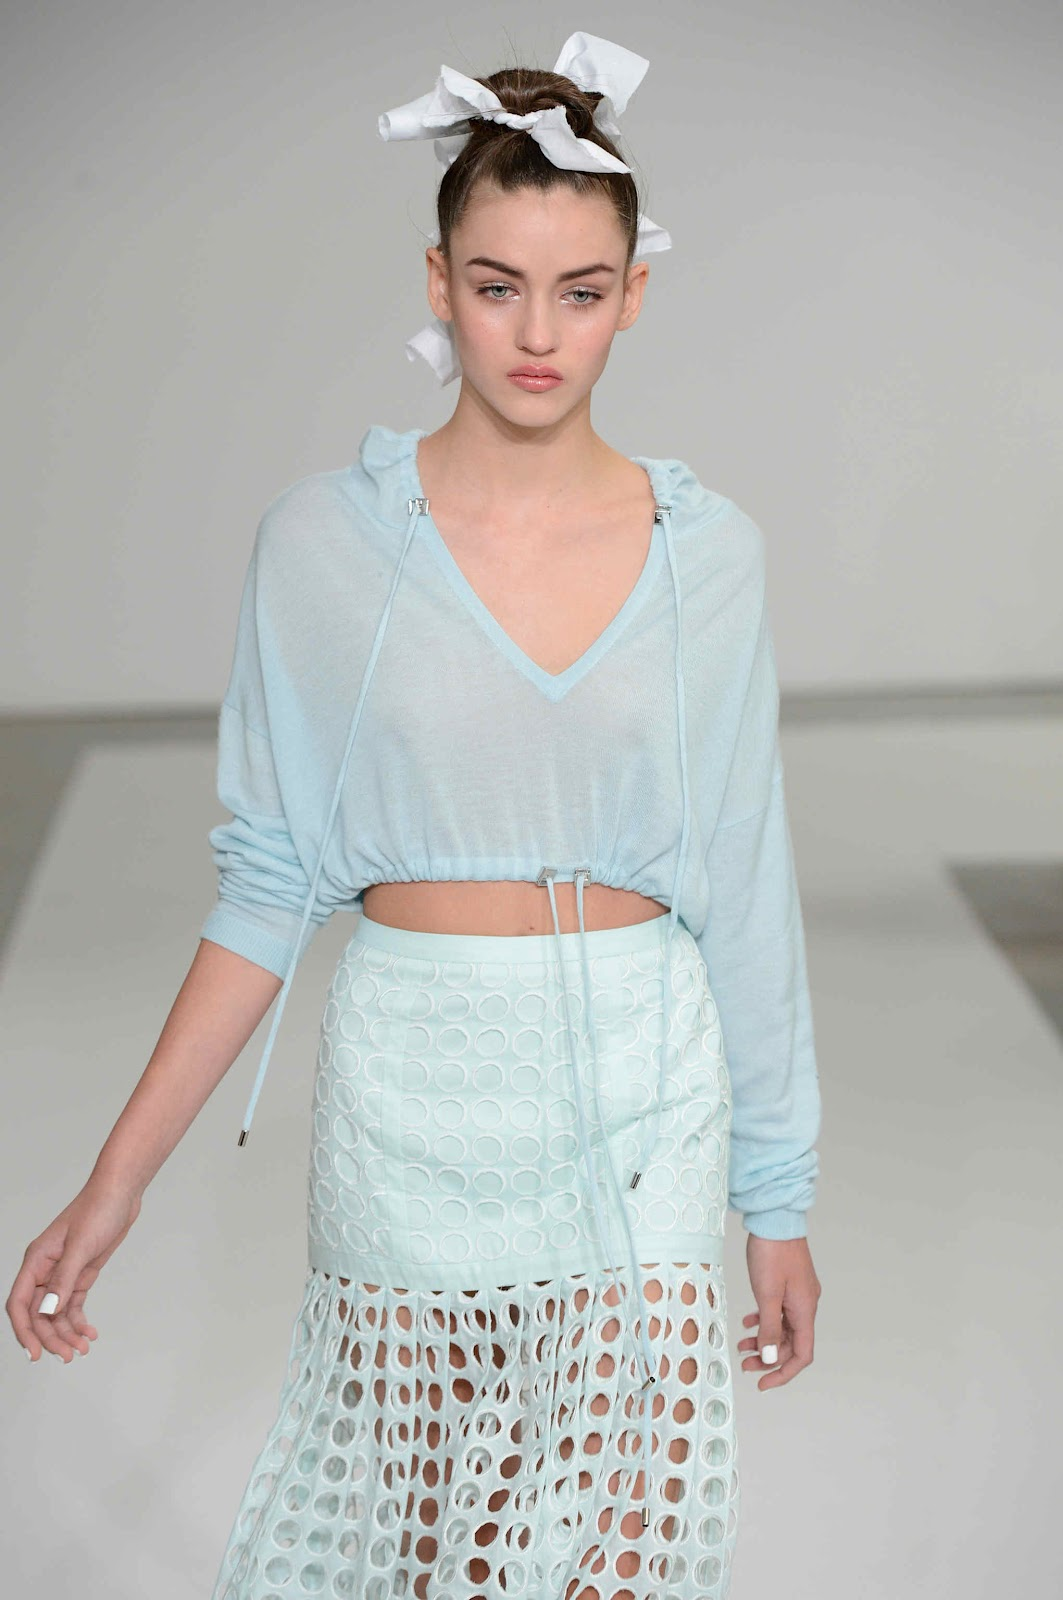 Zimmermann Feminine Dresses New York Fashion Week: Mademoiselle Katia: Zimmermann Spring- Summer 12/13